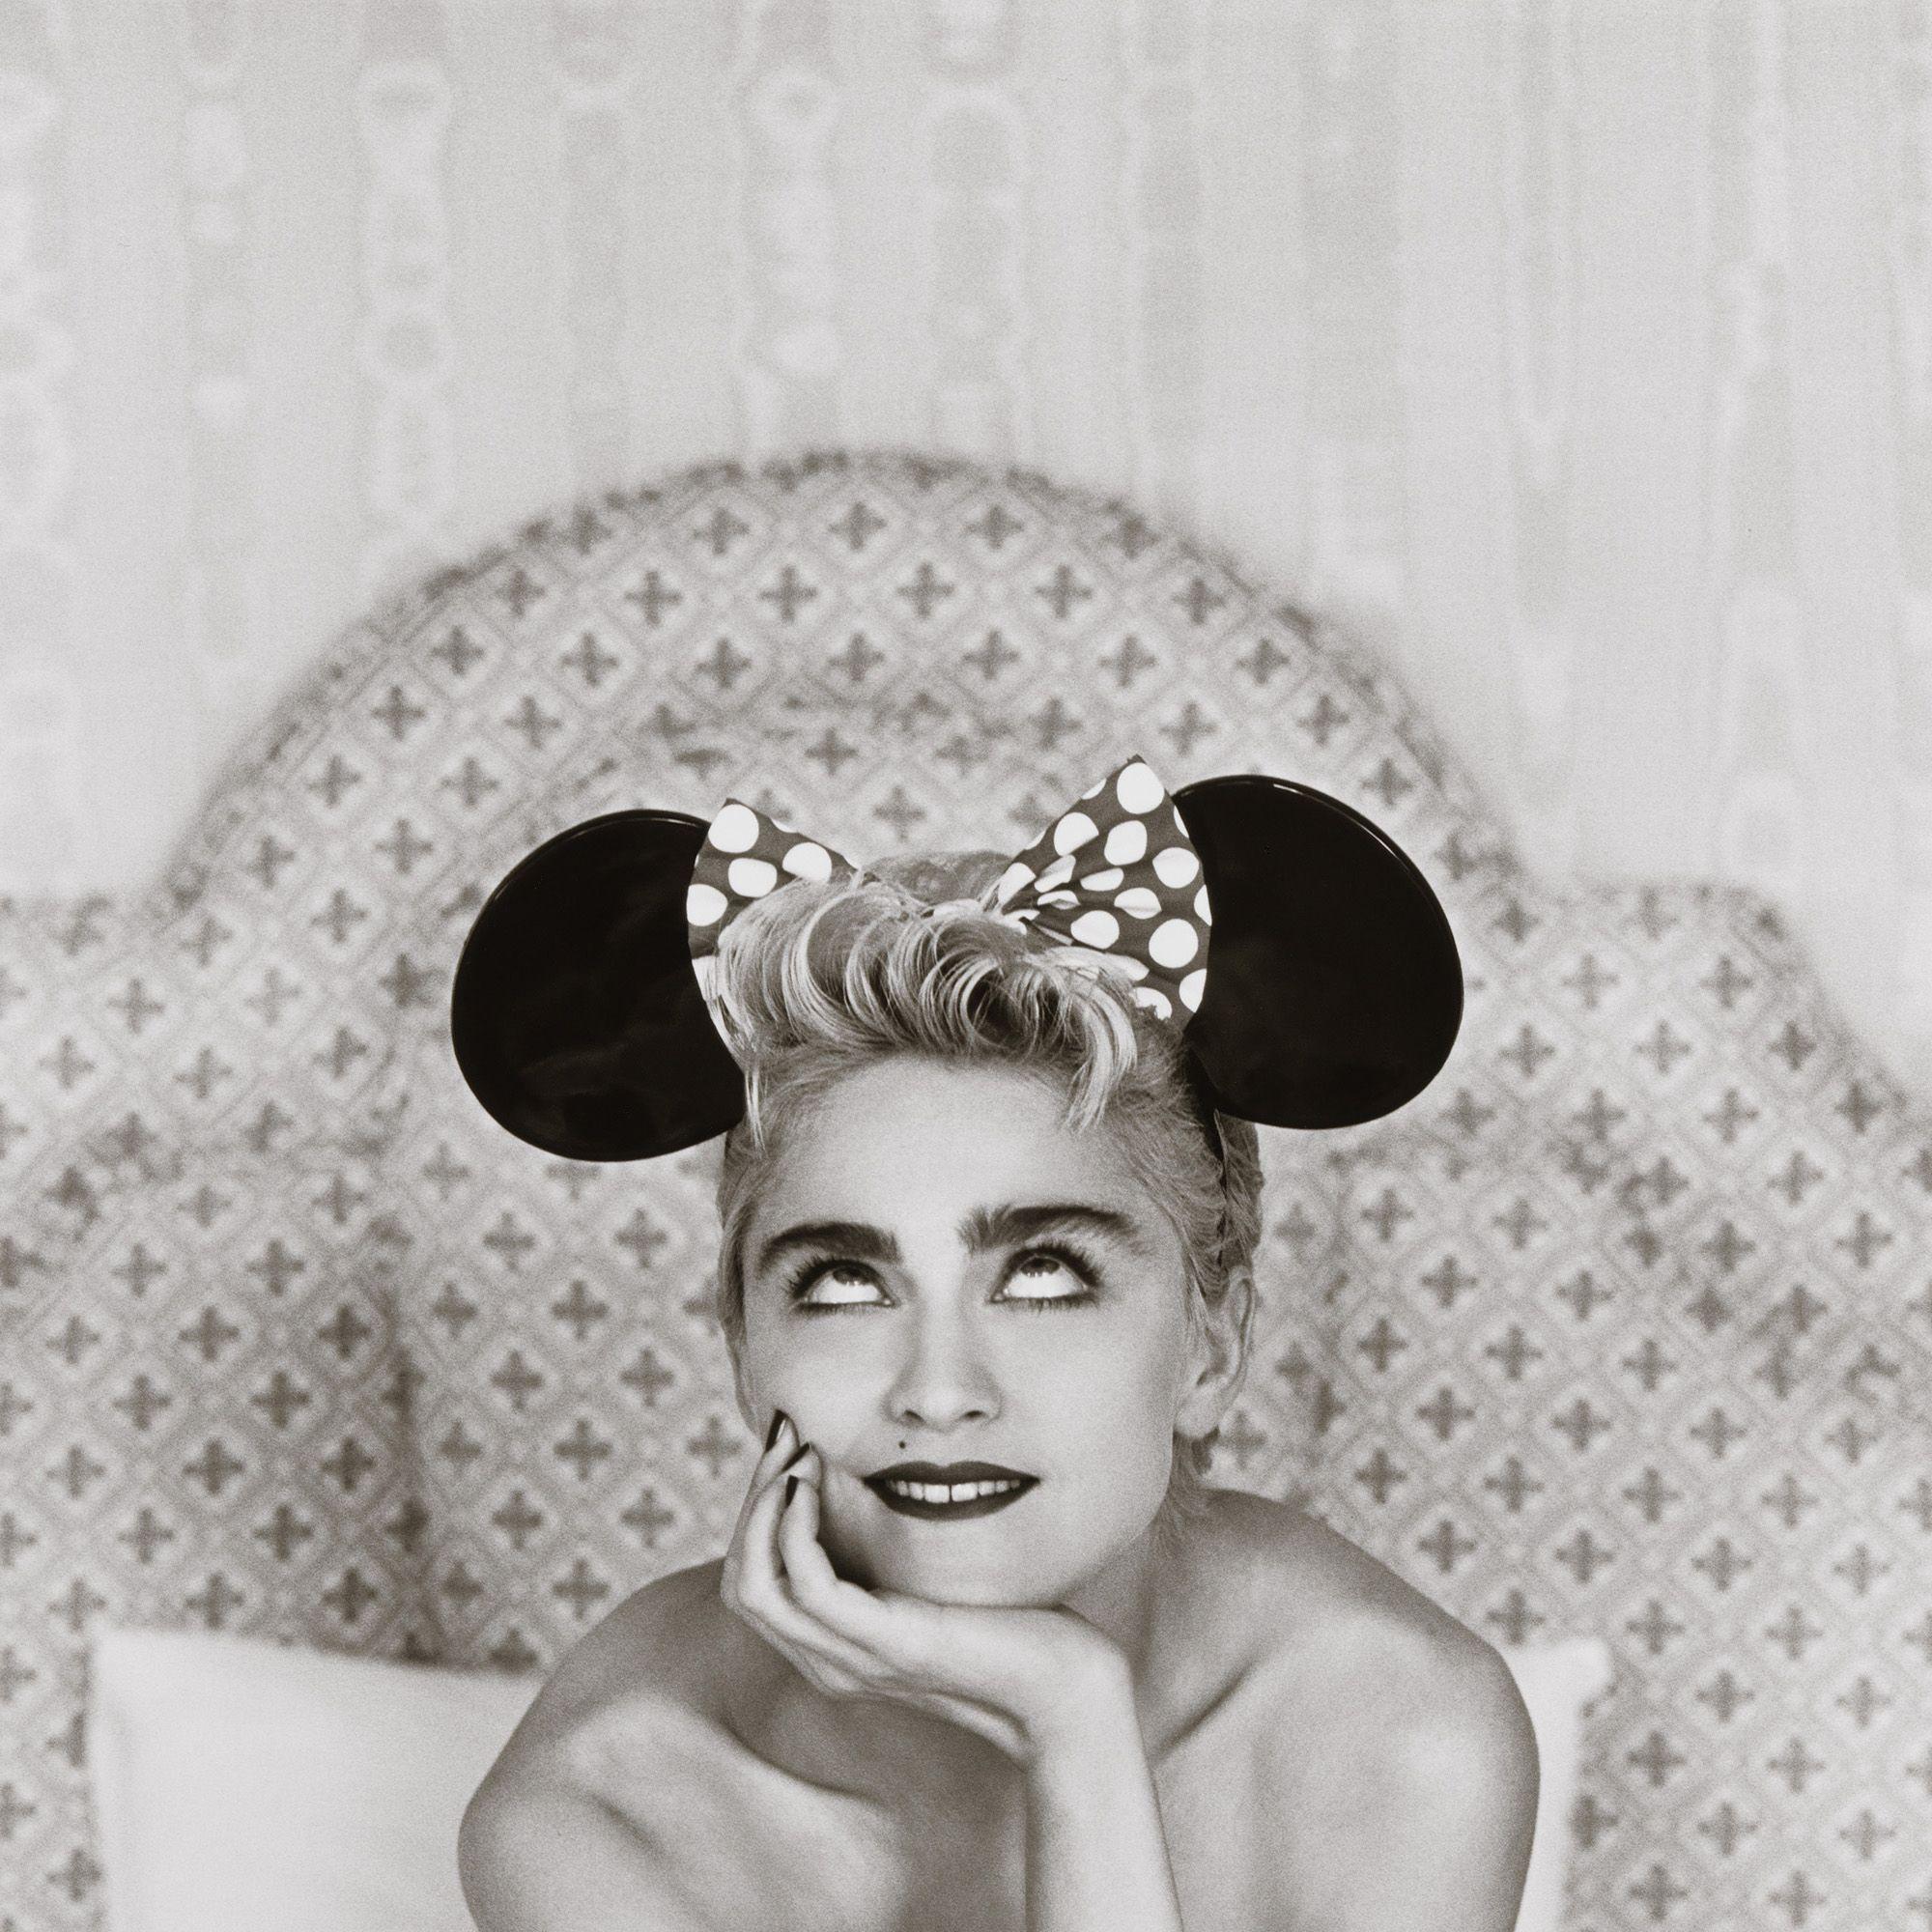 Madonna, Tokyo&#xA&#x3B;Herb Ritts (American, 1952–2002)&#xA&#x3B;1987&#xA&#x3B;Photograph, gelatin silver print&#xA&#x3B;* Gift of Herb Ritts&#xA&#x3B;© Herb Ritts Foundation&#xA&#x3B;* Courtesy Museum of Fine Arts, Boston